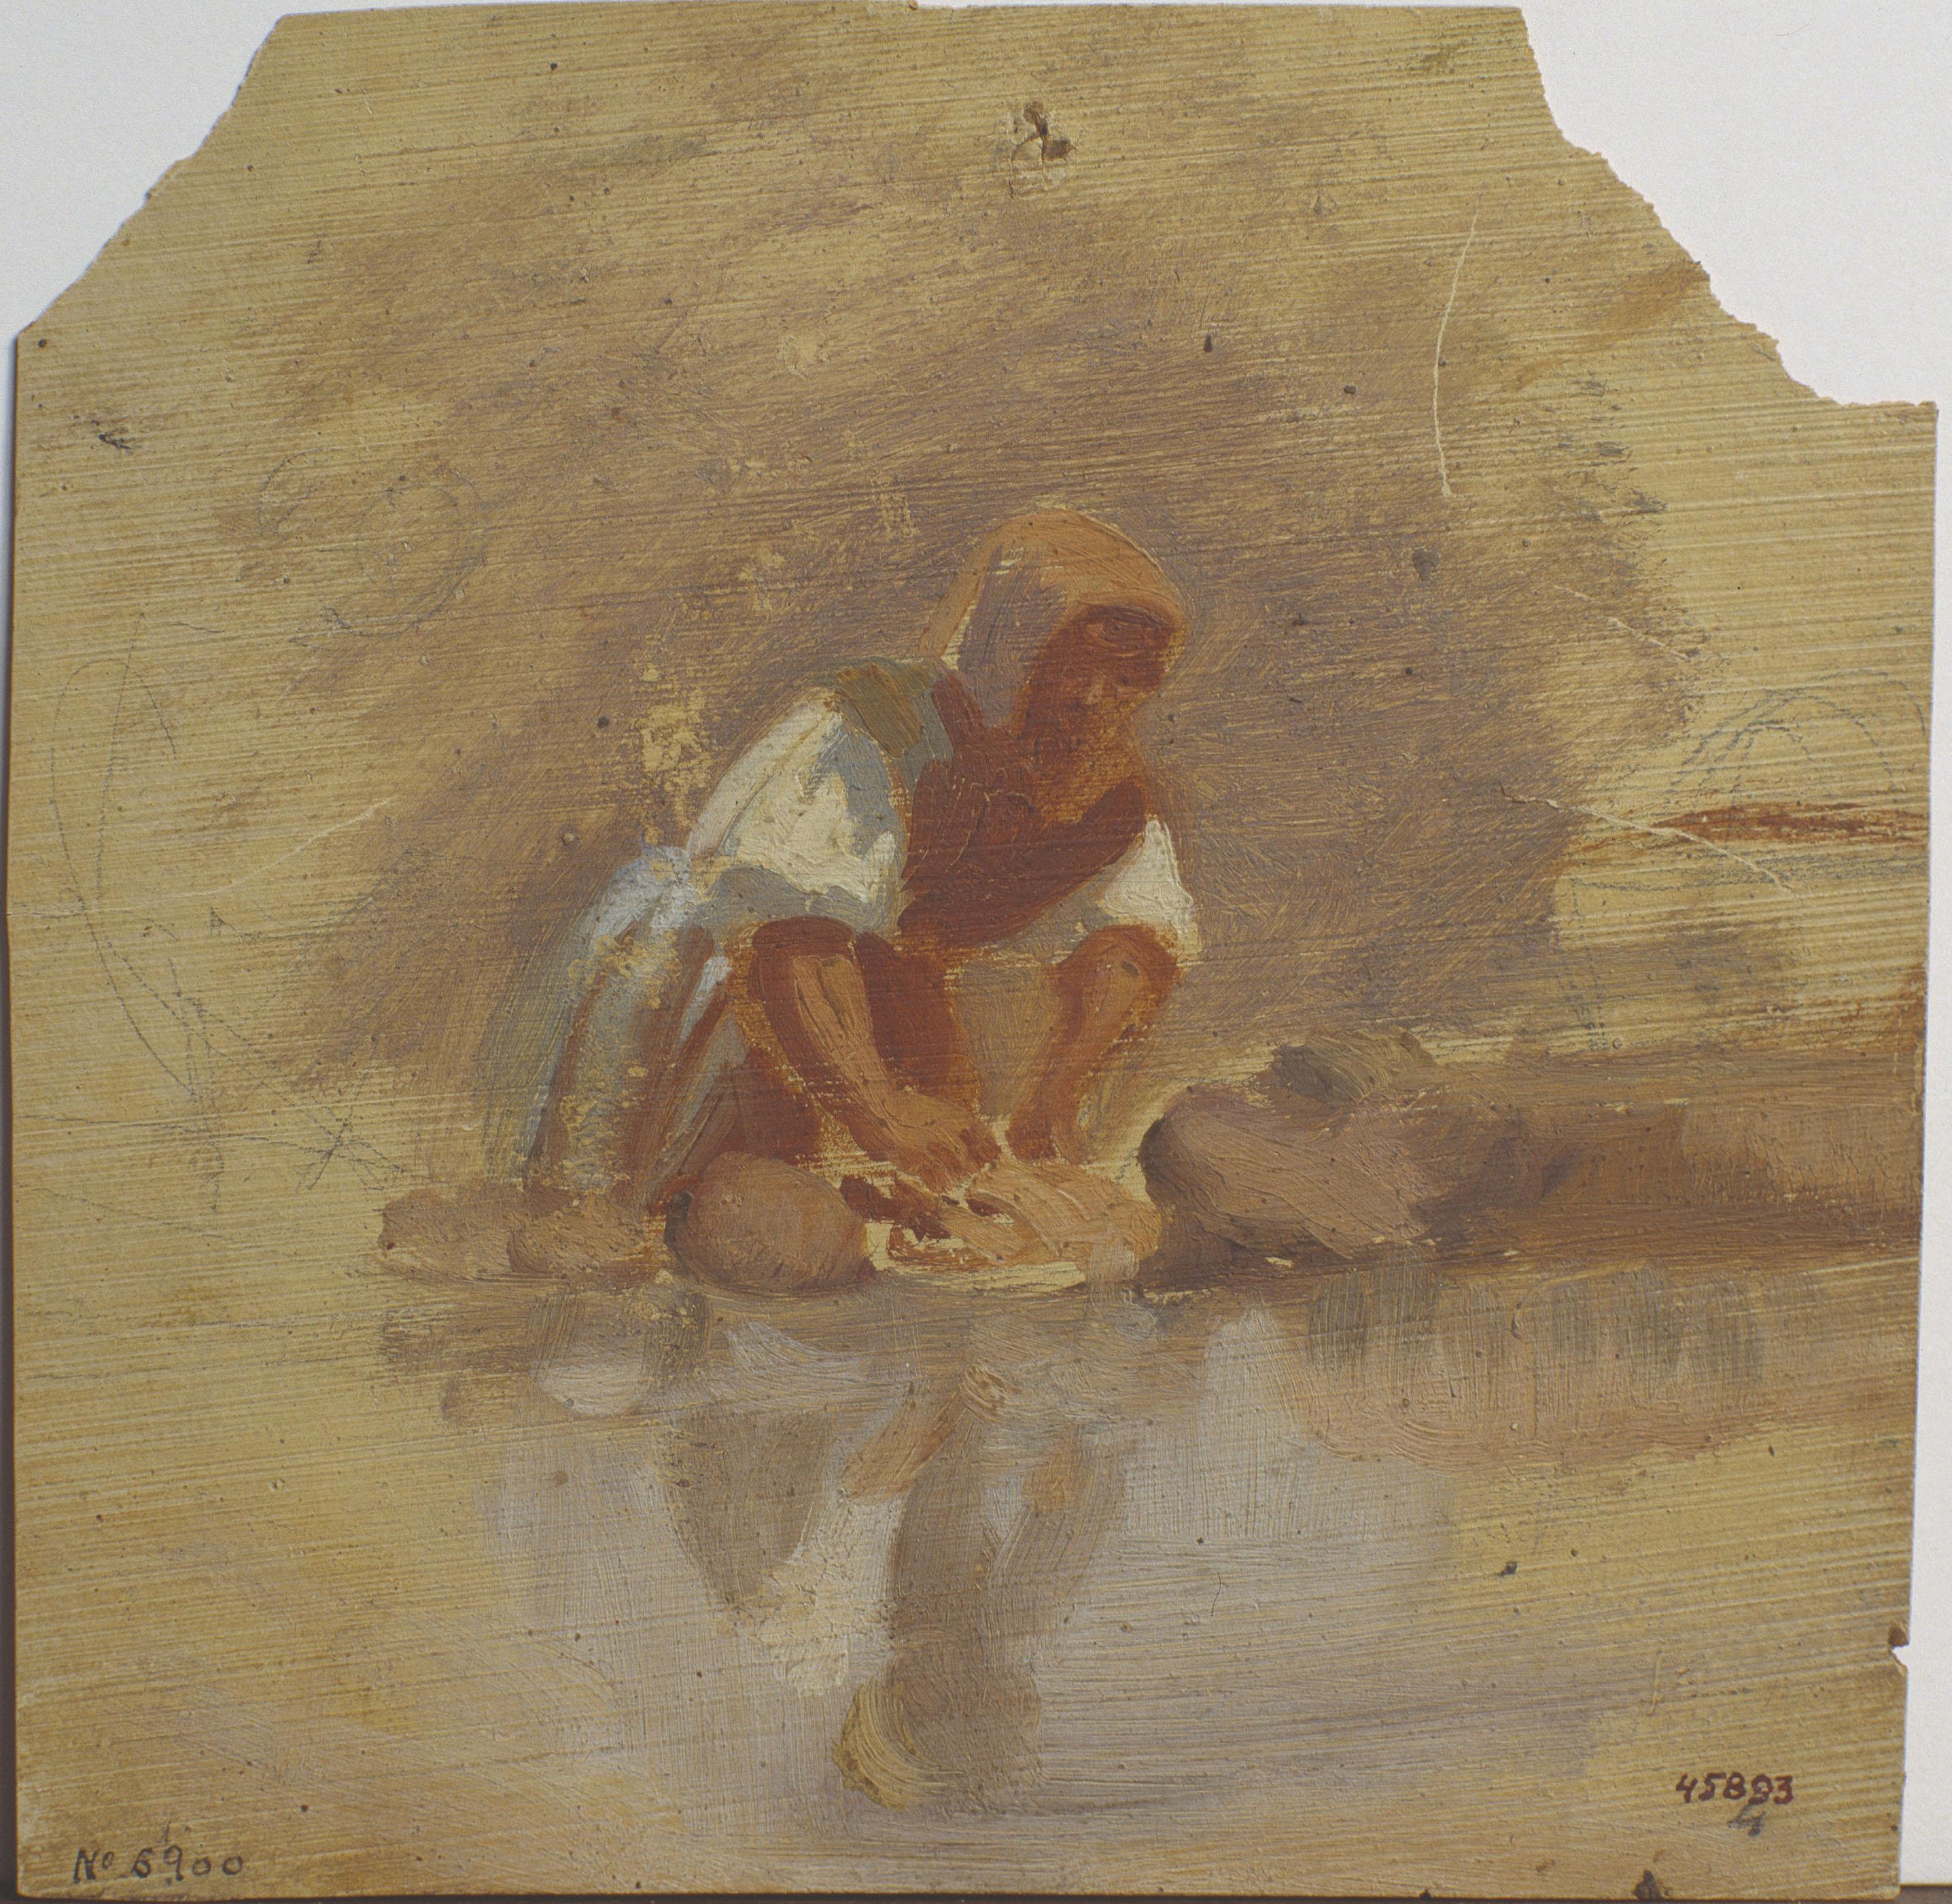 Marià Fortuny - Washerwoman - Circa 1858-1859